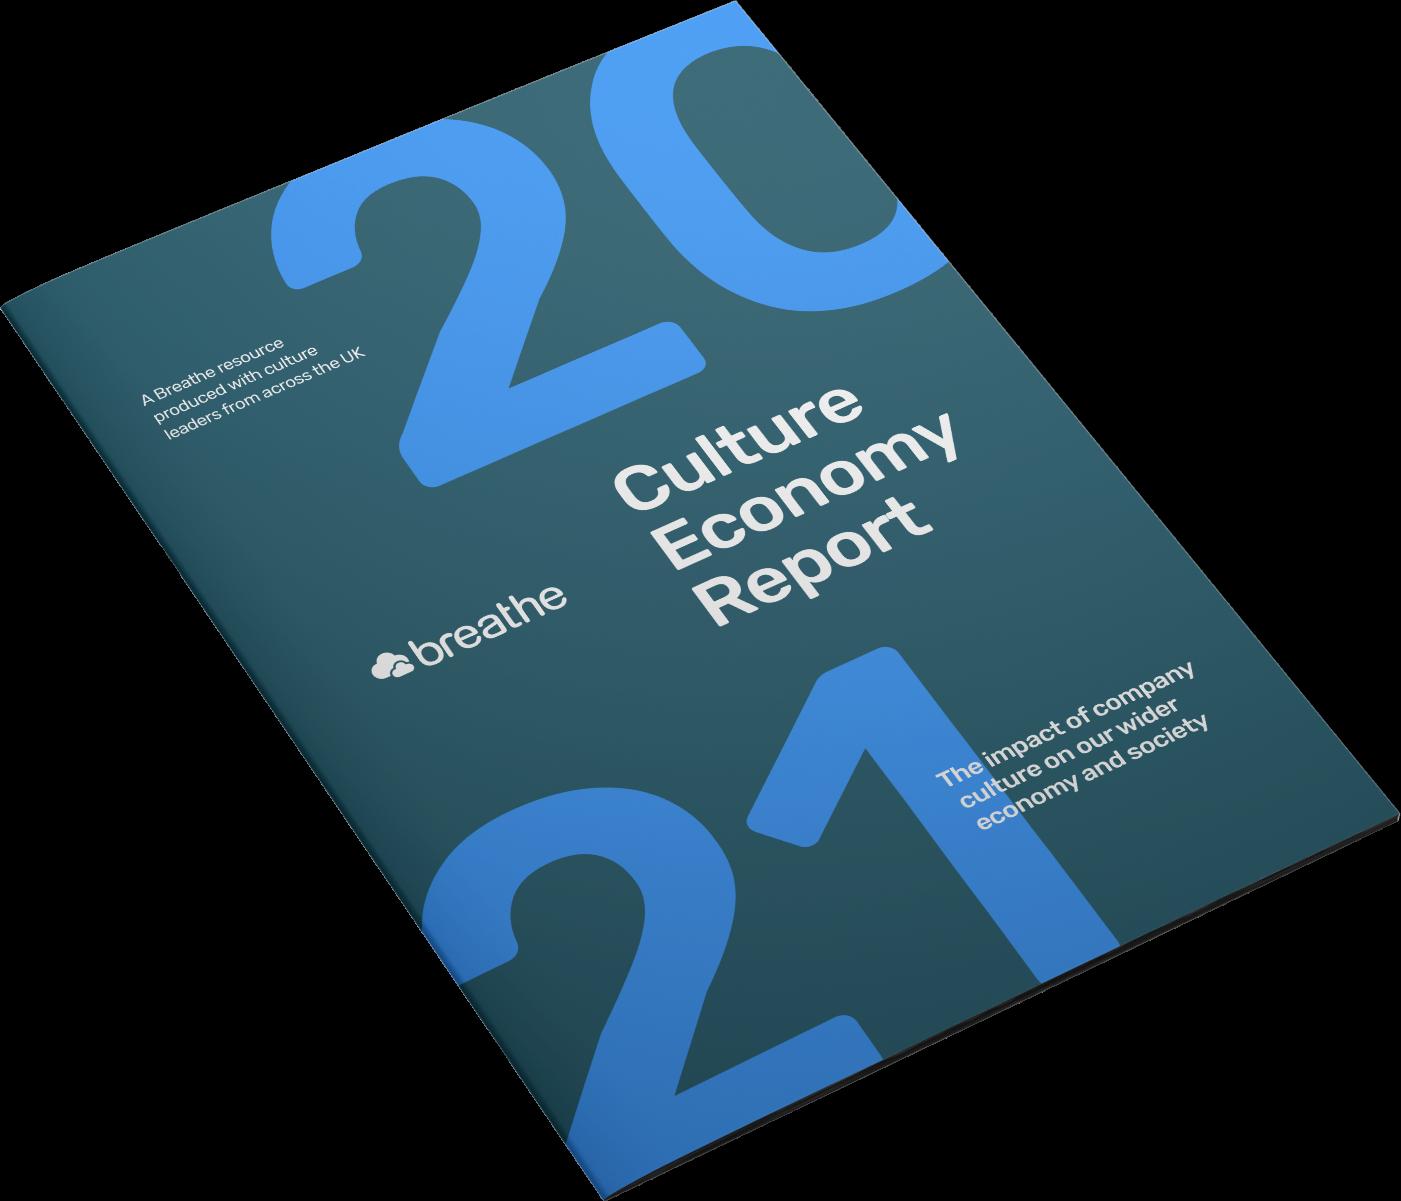 Breathe CE Report A4 Guide Cover Mockup (3) (1)